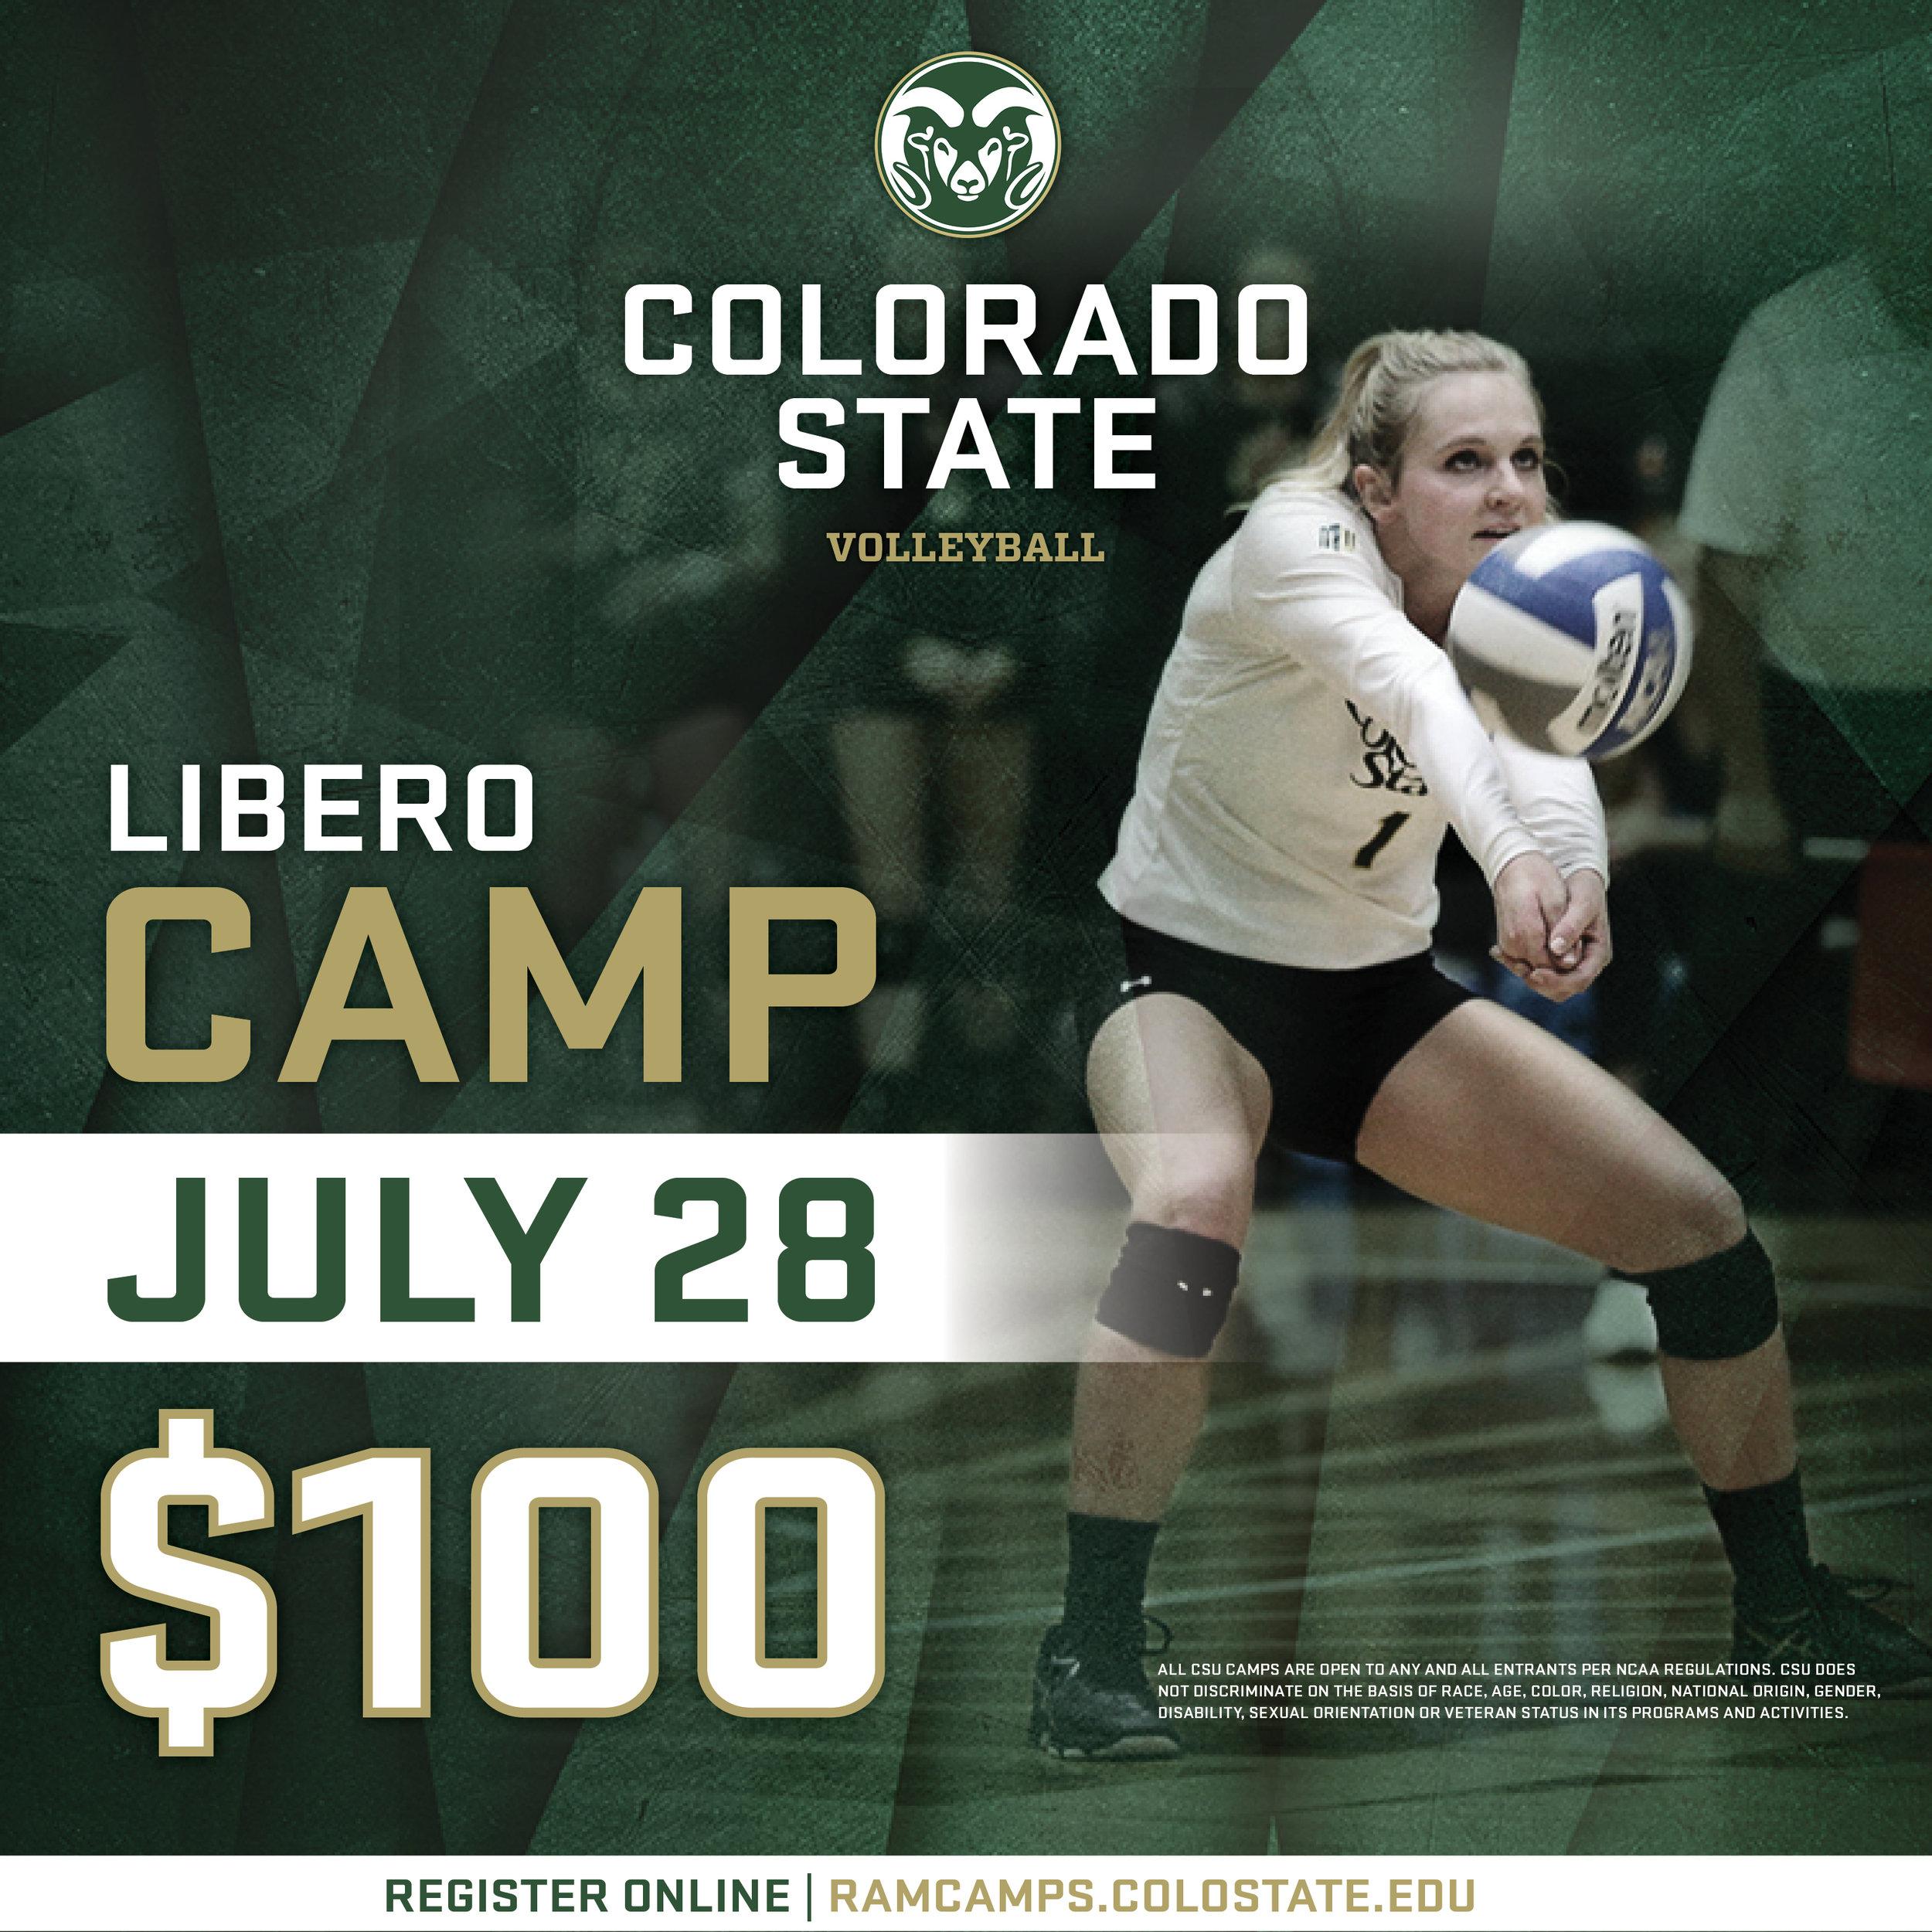 2017 camp dates graphic-libero.jpg